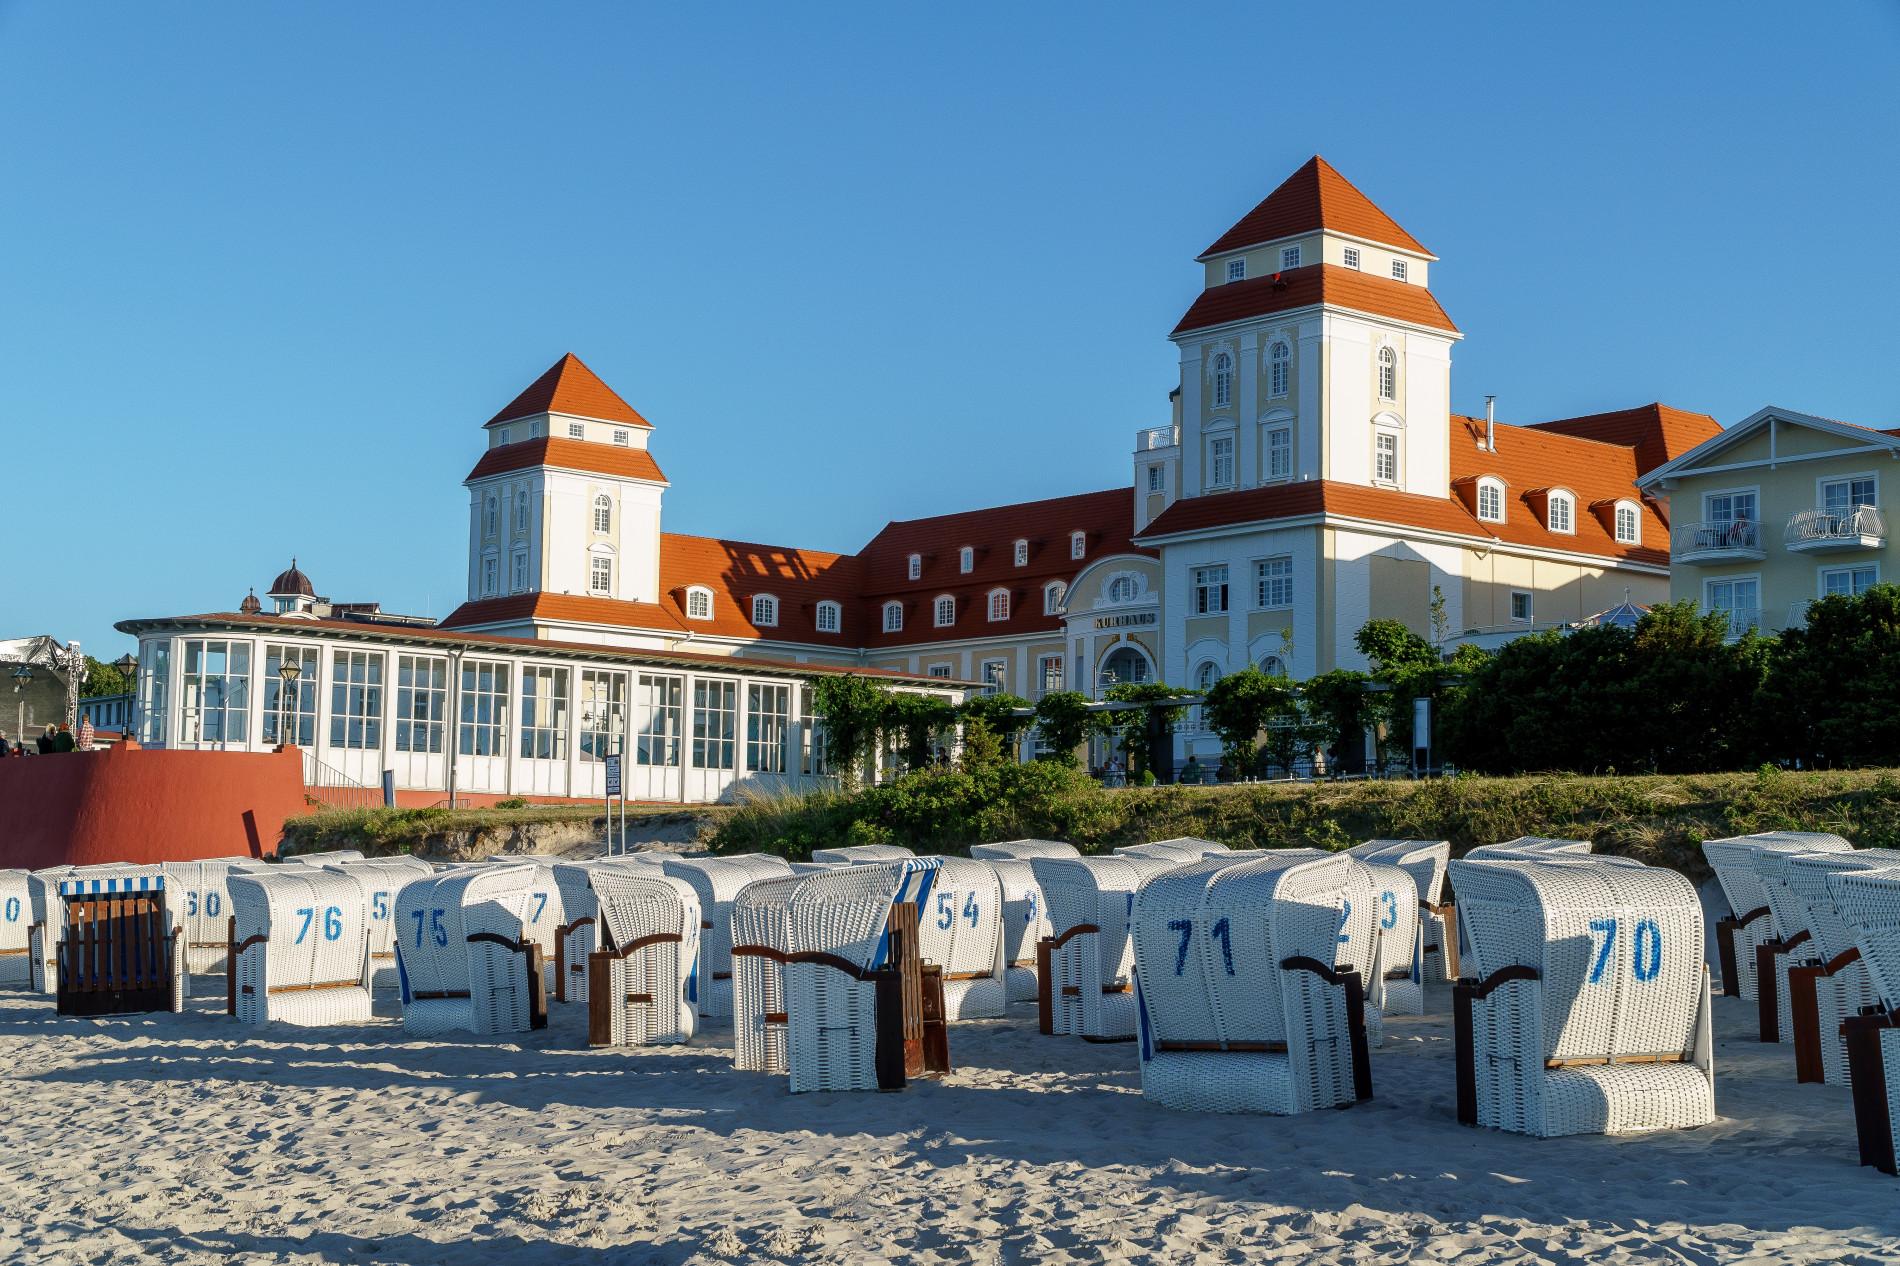 Kurhaus Strandkörbe